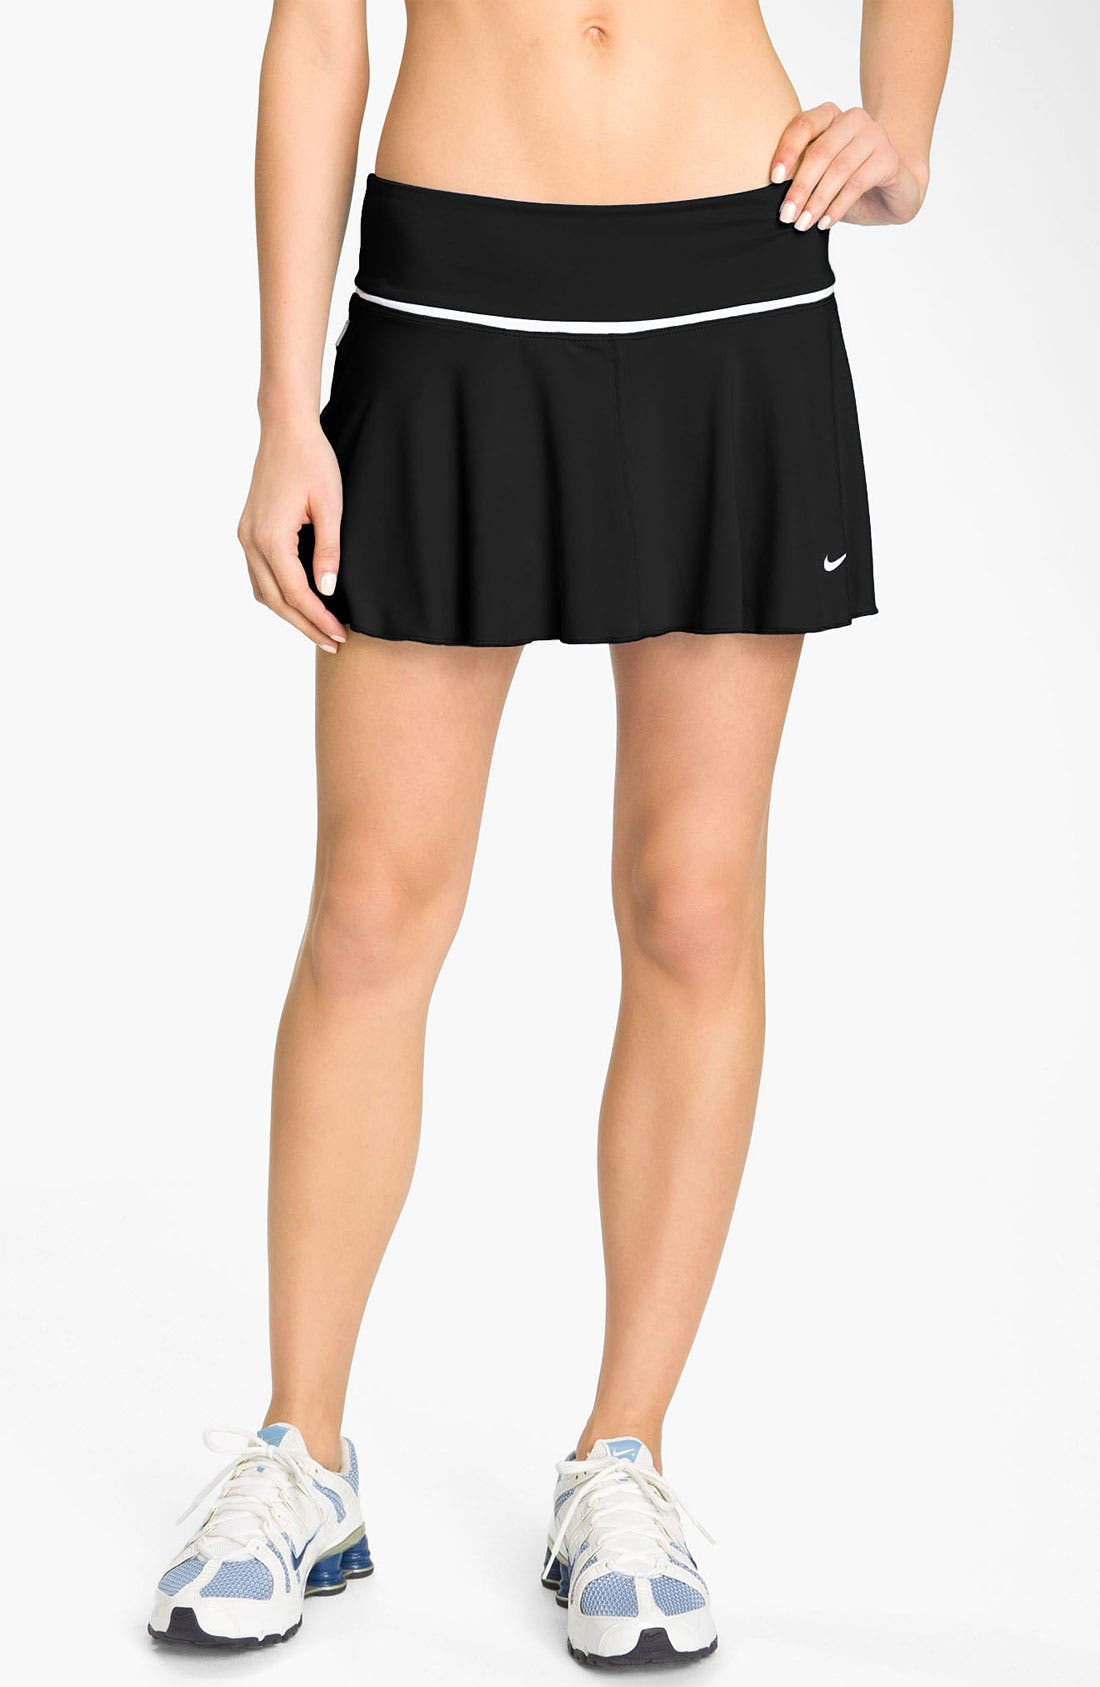 Alternate Image 1 Selected - Nike 'Flounce' Tennis Skirt